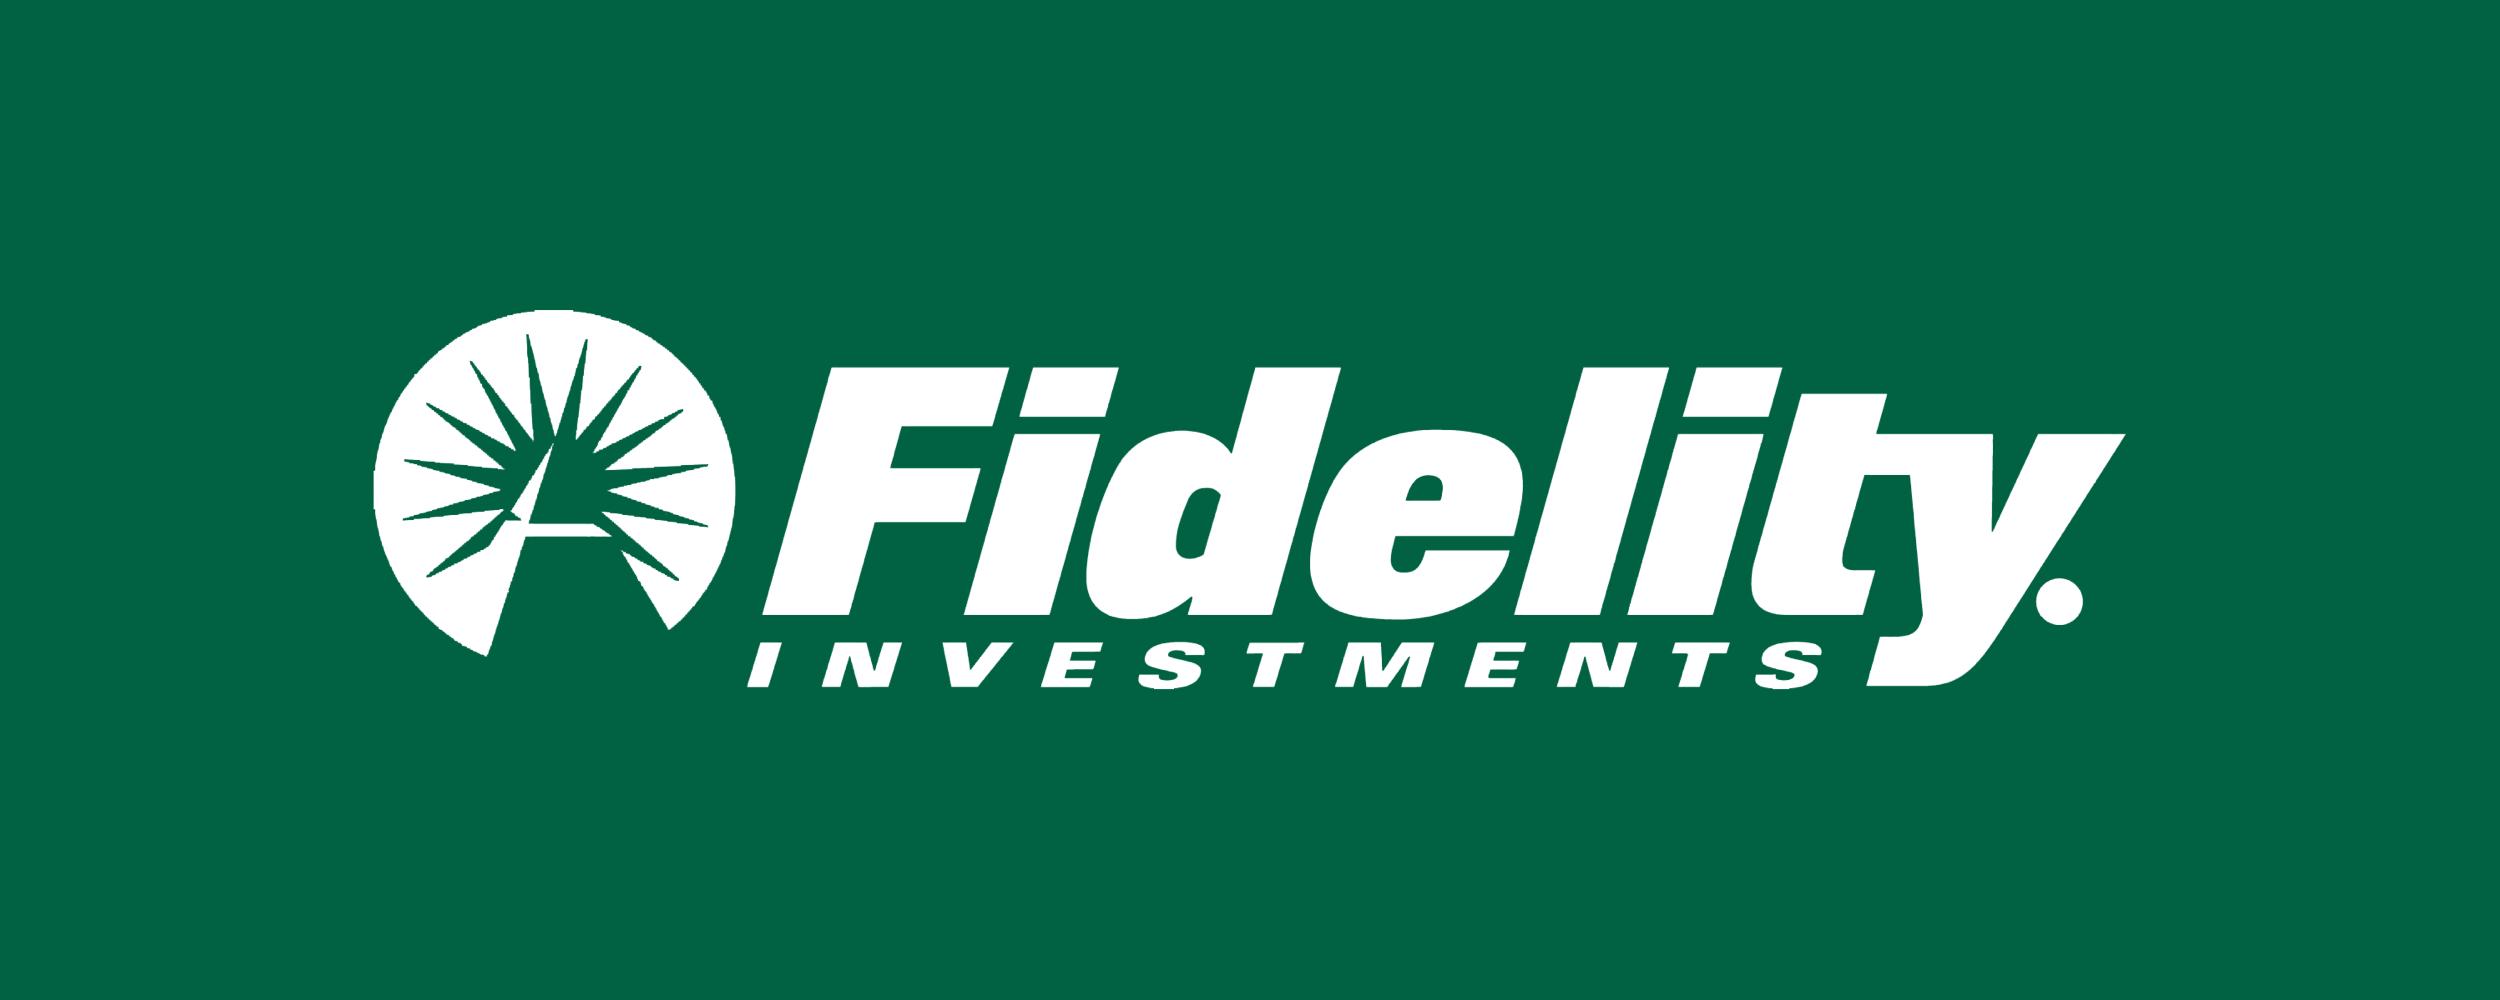 Fidelity Investments Dayton, OH Gudorf Financial Group, LLC